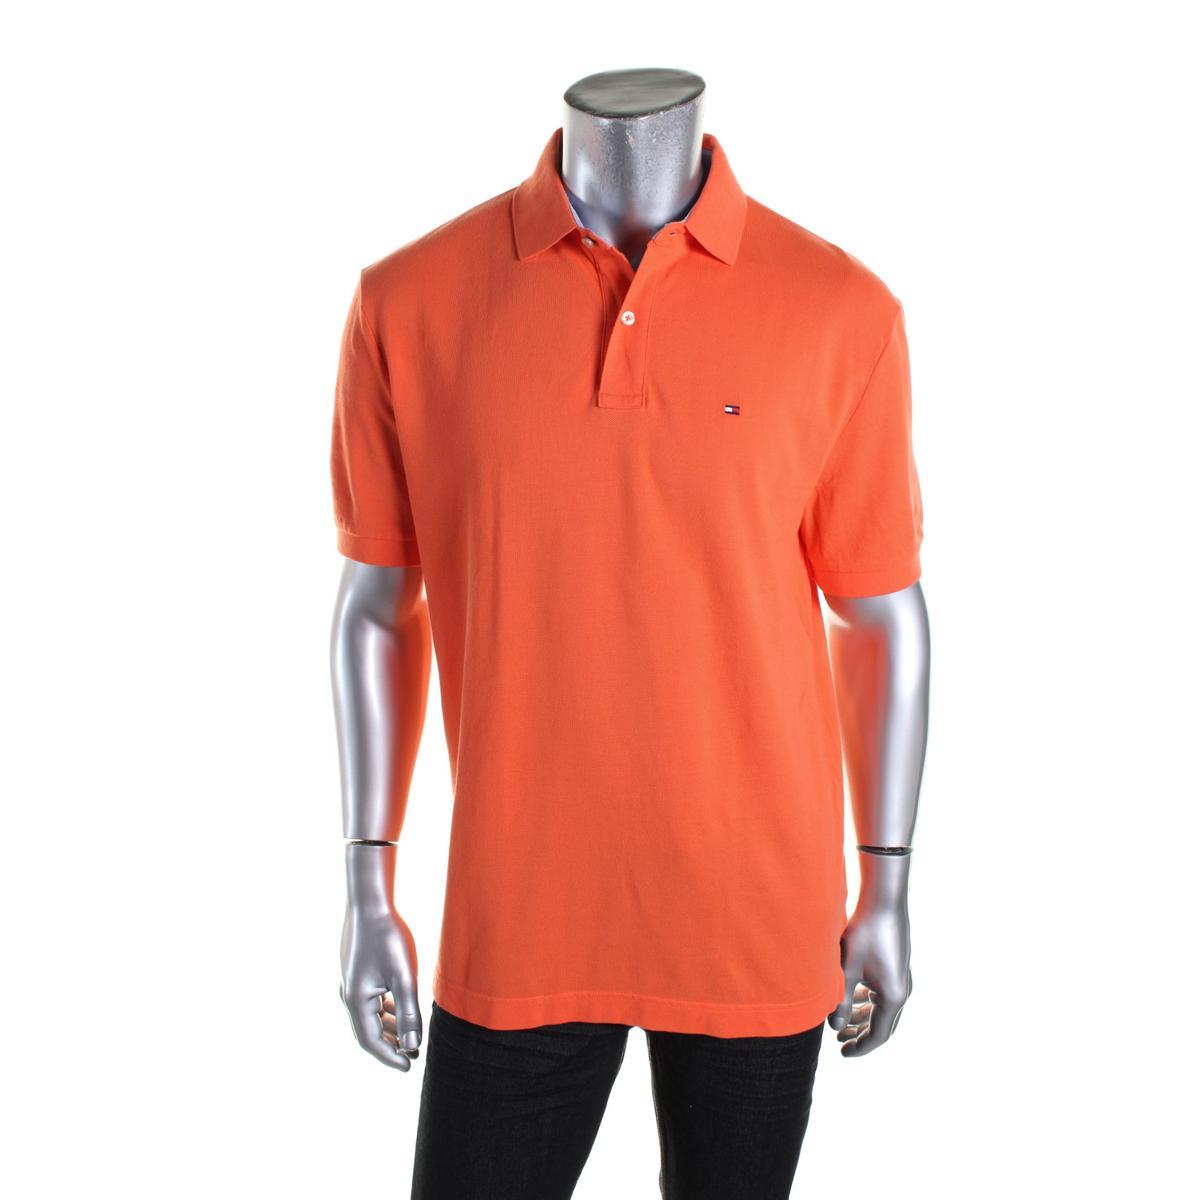 Tommy Hilfiger 9289 Mens Cotton Classic Fit Monogram Polo